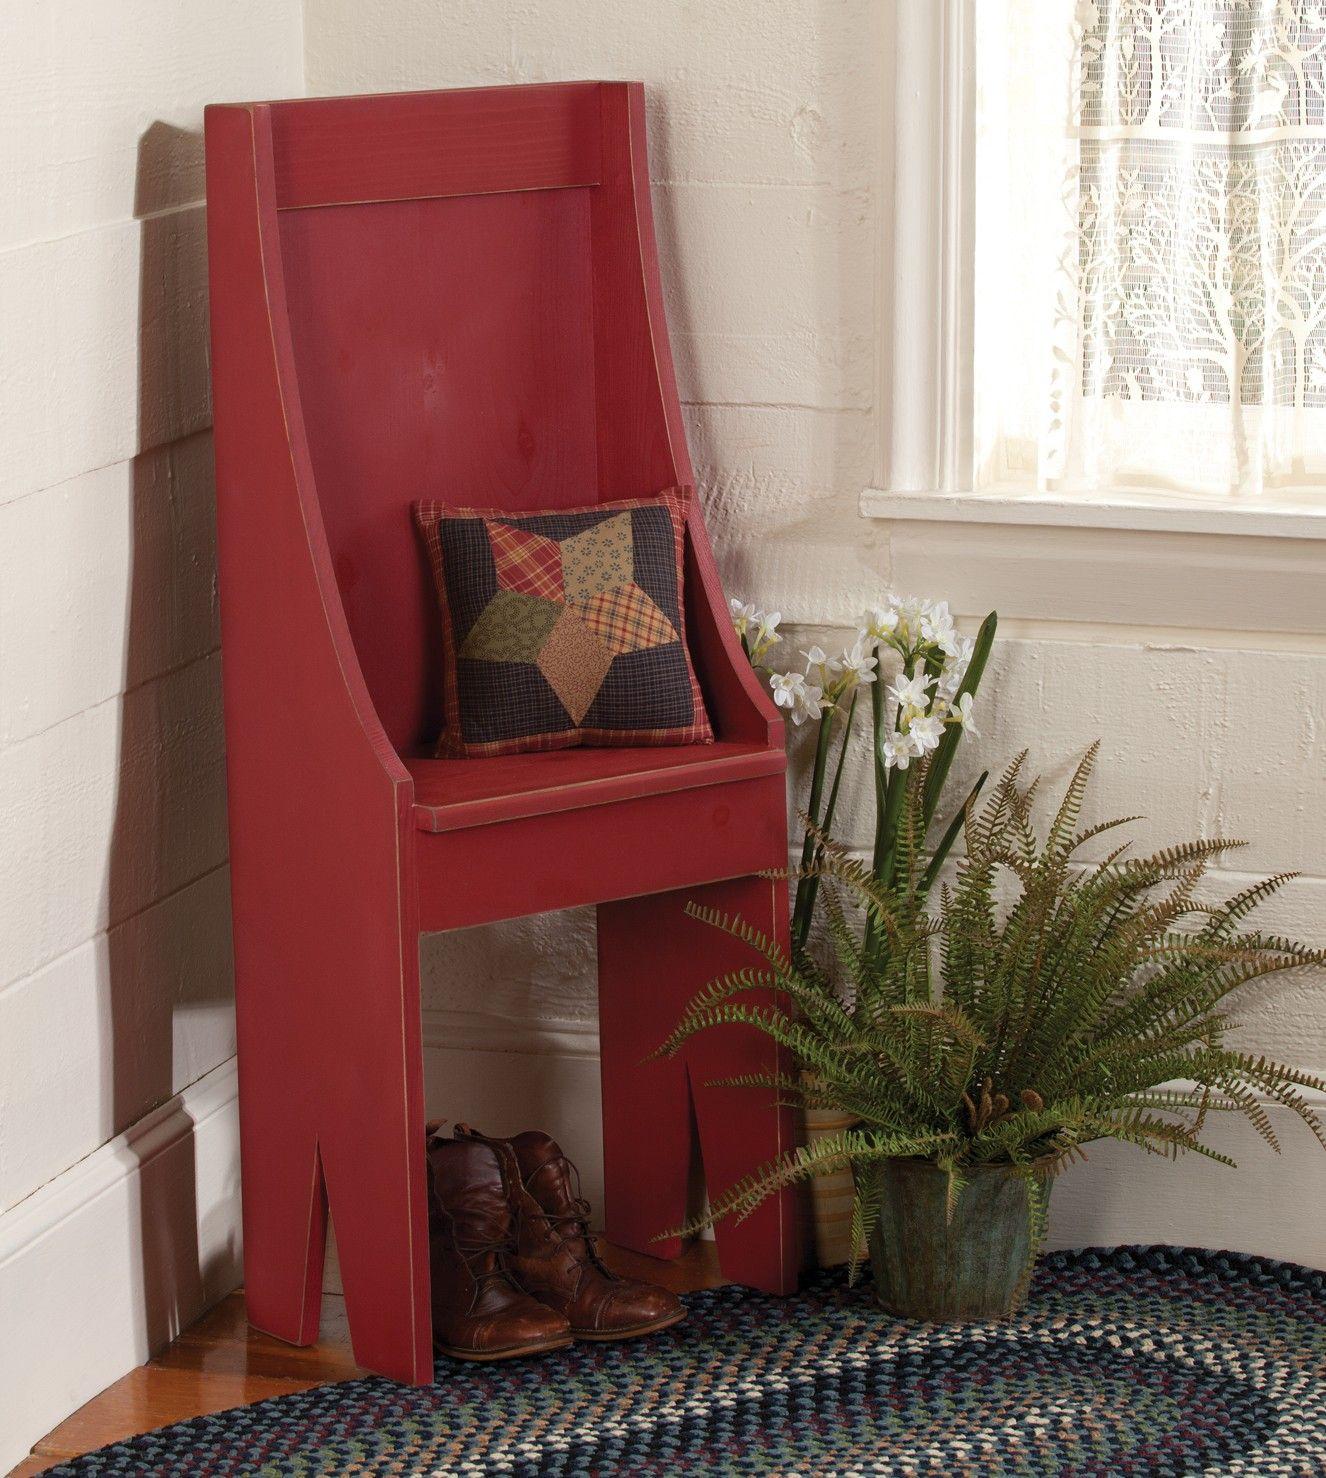 Country Primitive Sofa Tables Ergonomic Couch Pine Entryway Chair Prim Decor